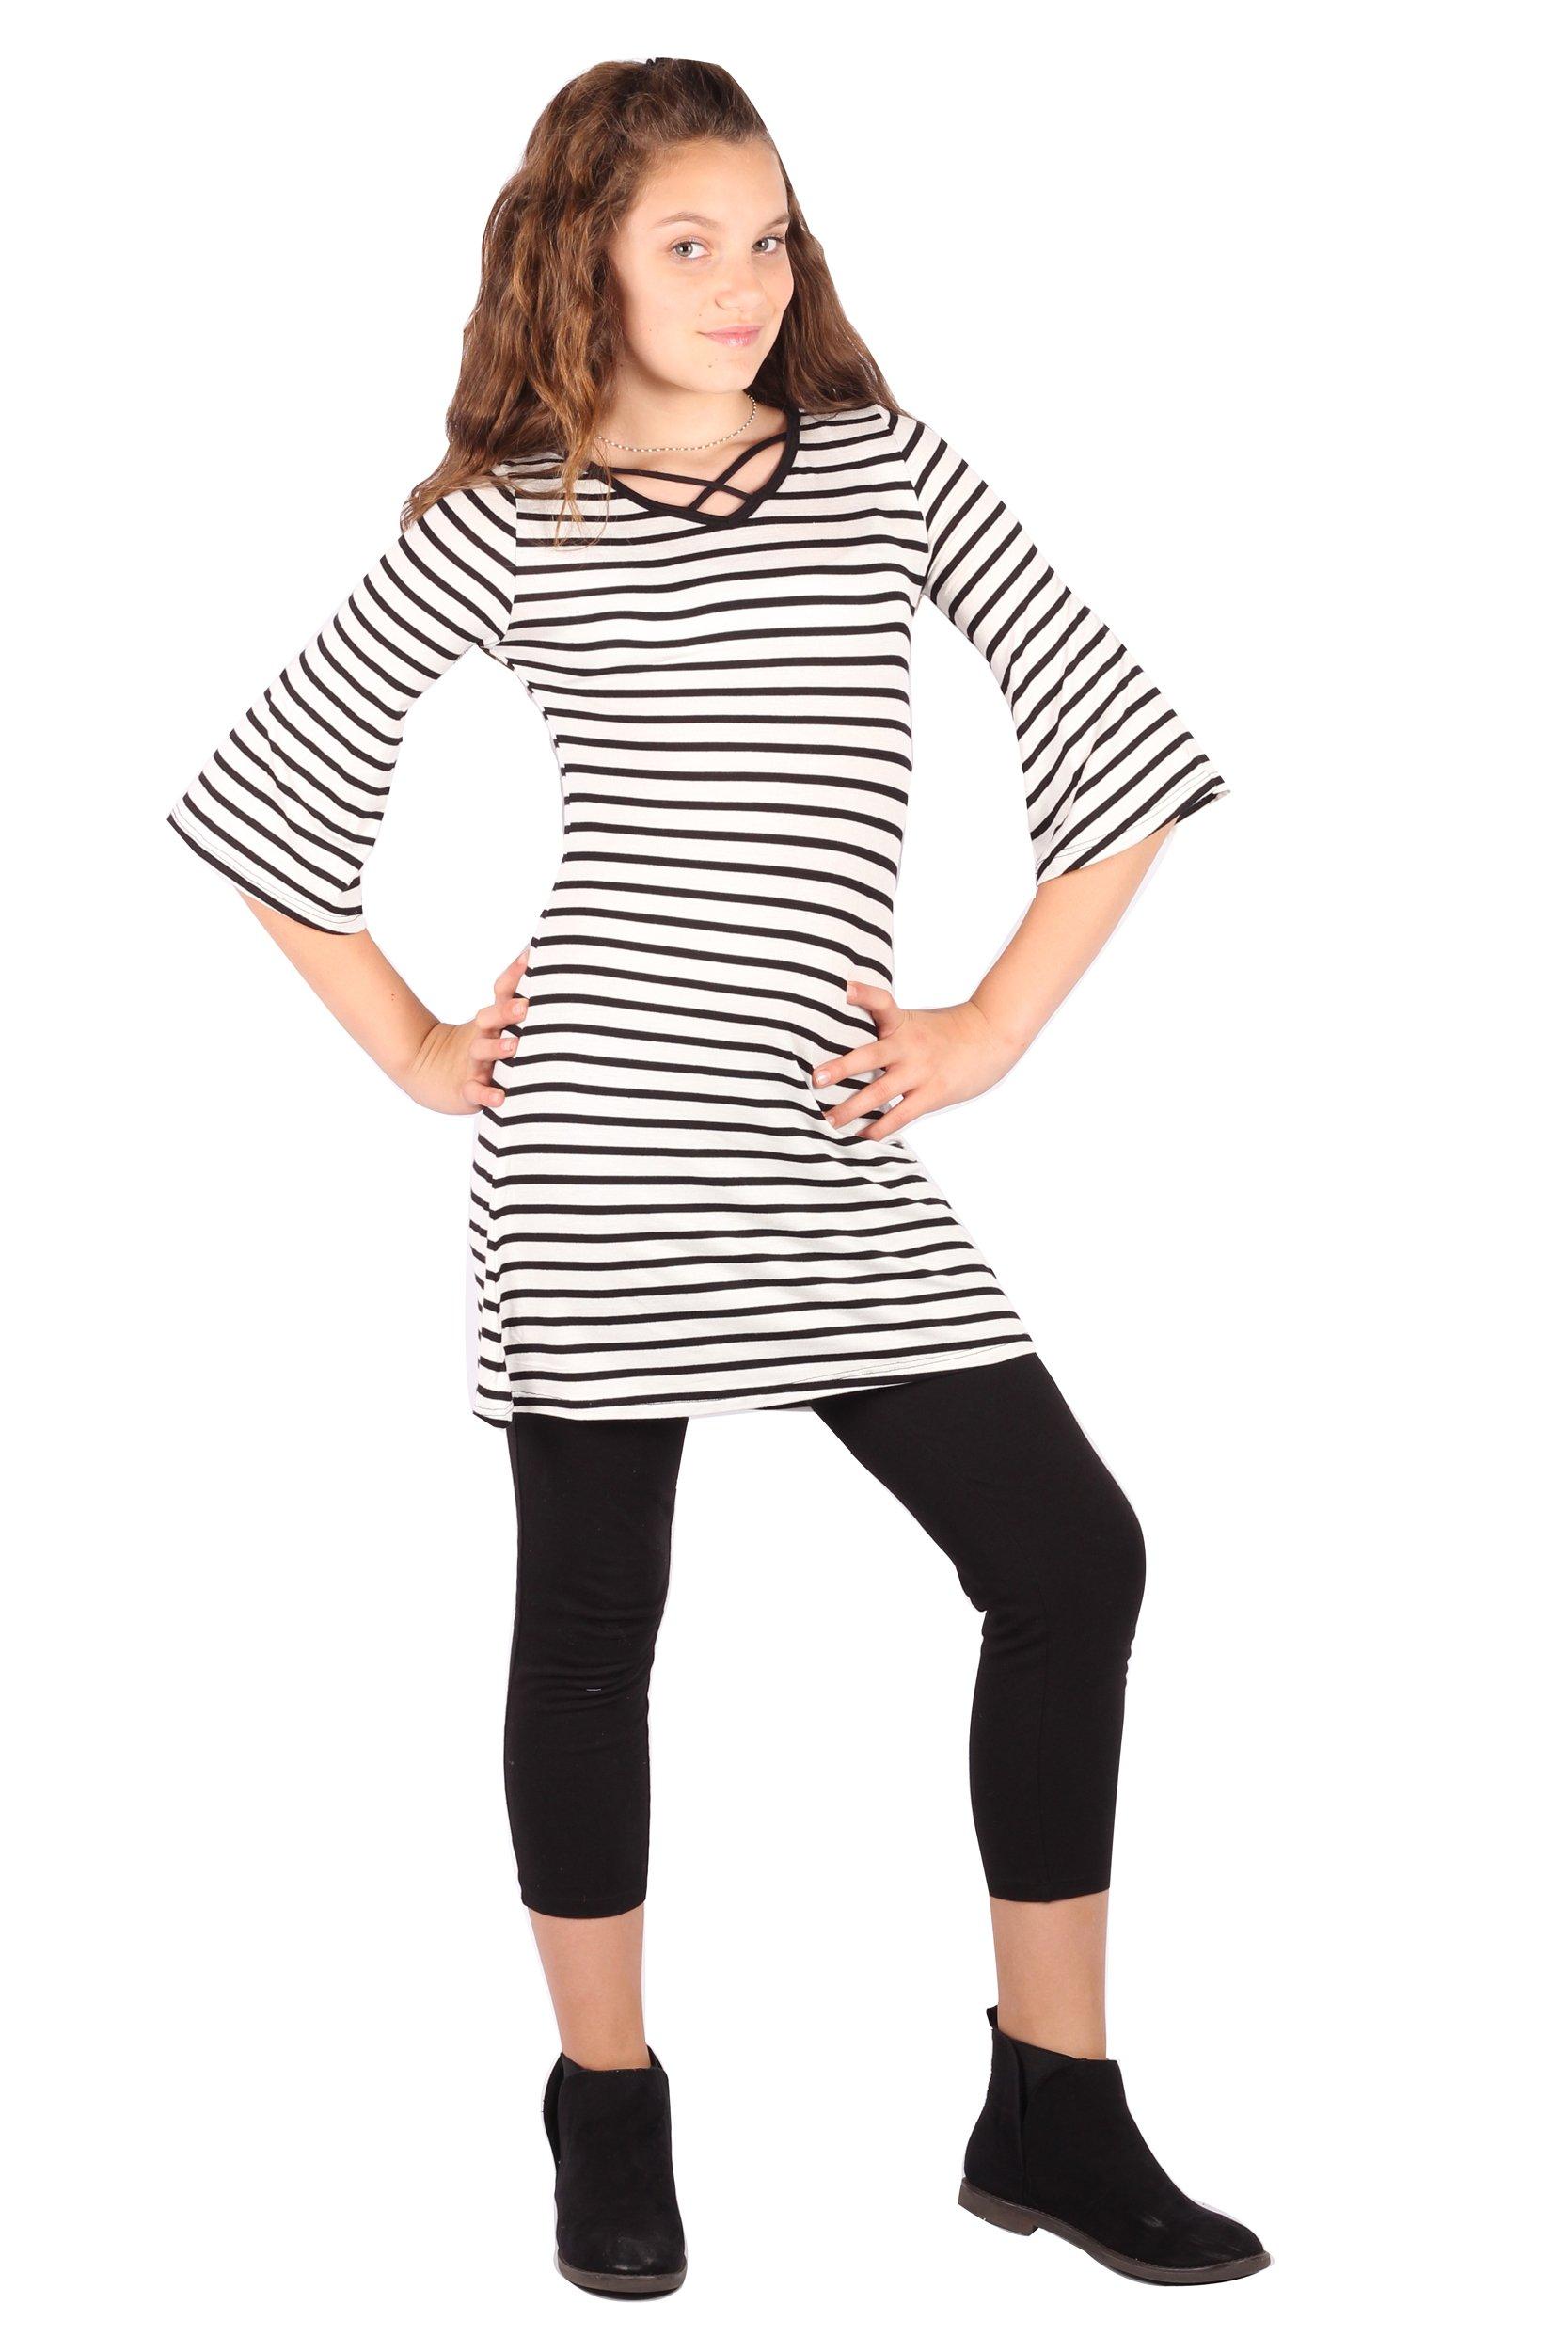 Lori&Jane Girl's Criss Cross Front Casual Loose Fit Tunic T-Shirt Dress (Black/White Small Stripes, 10/12)